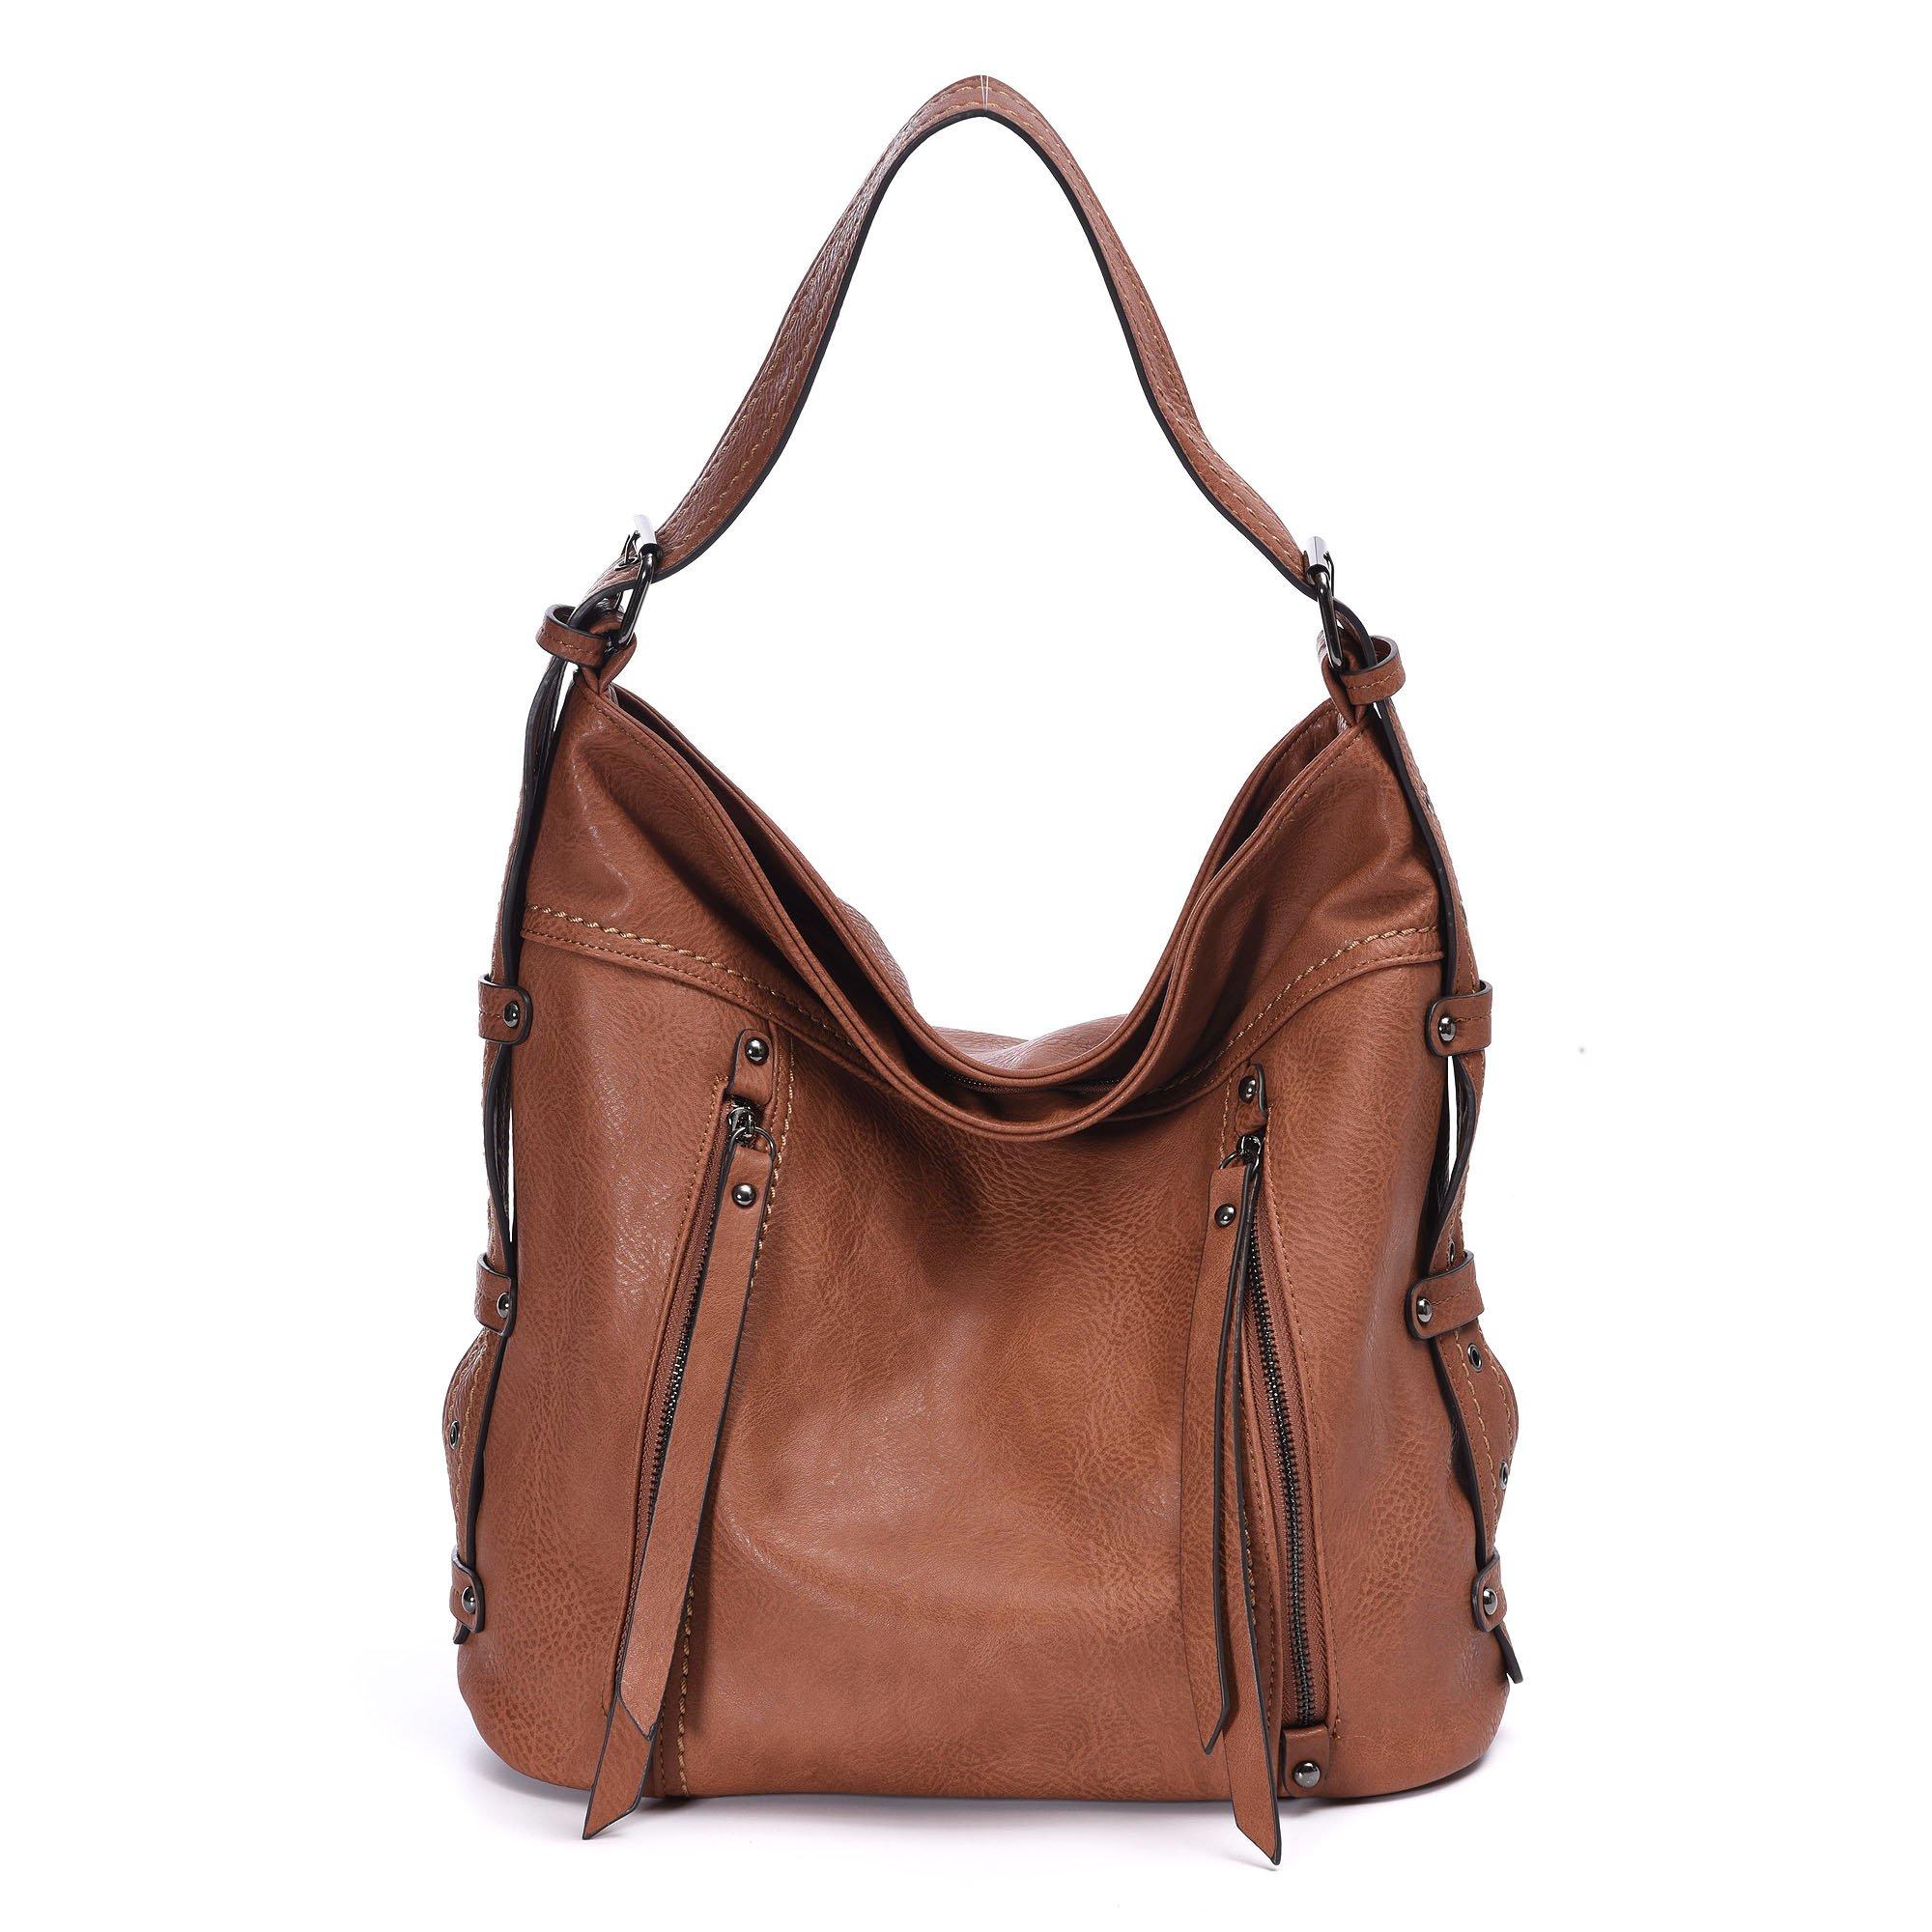 eb42bba061d Get Quotations · Digruel Hobo Bags For Women Large Hobo Handbags Designer  Leather Handbag Retro Crossbody Tote Top Handle